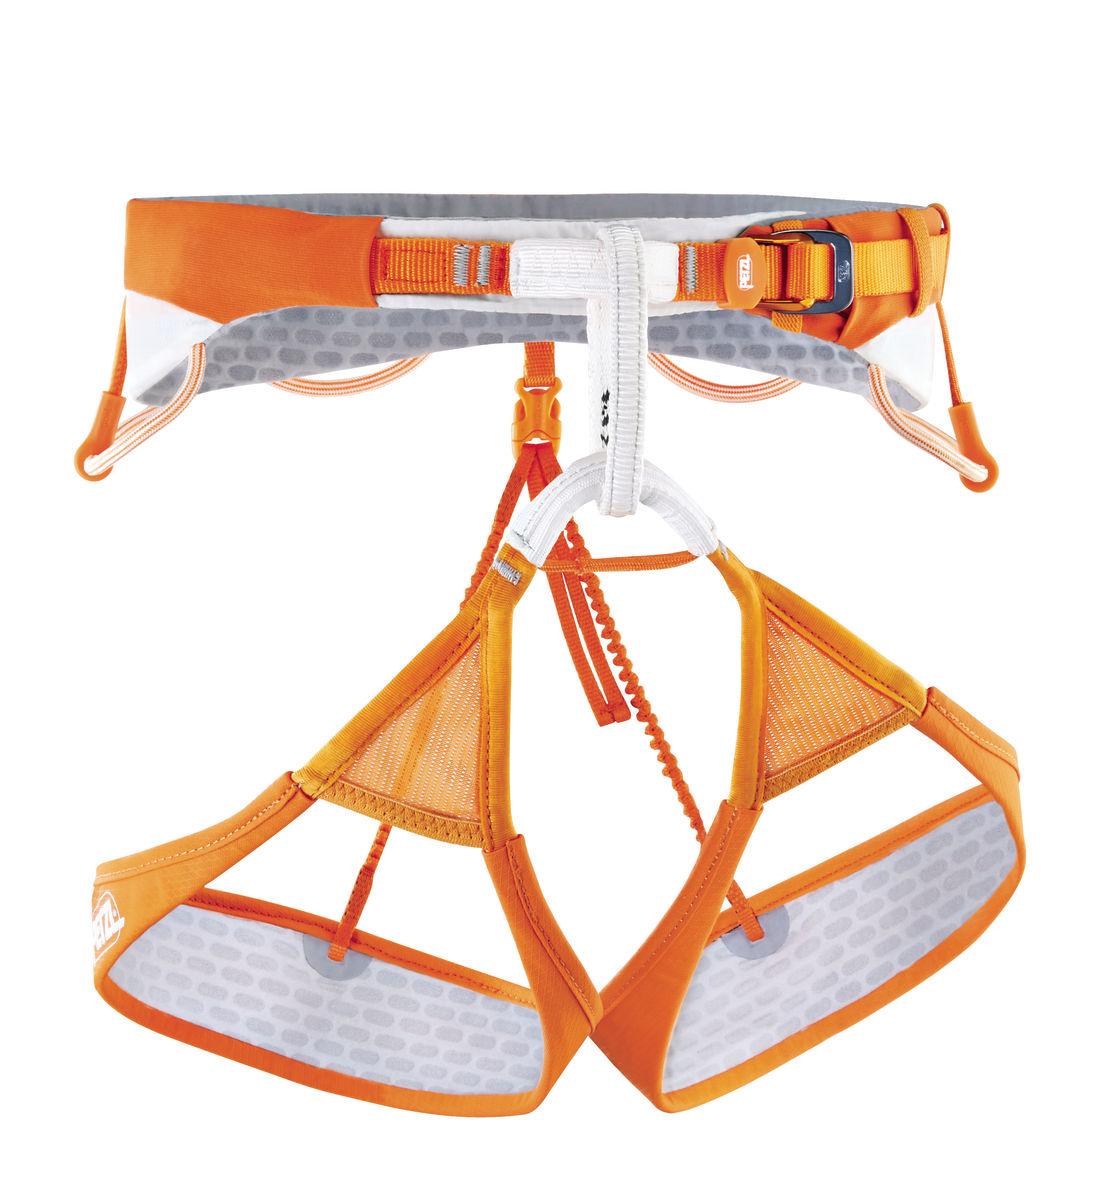 Petzl - Sitta - Climbing Harness